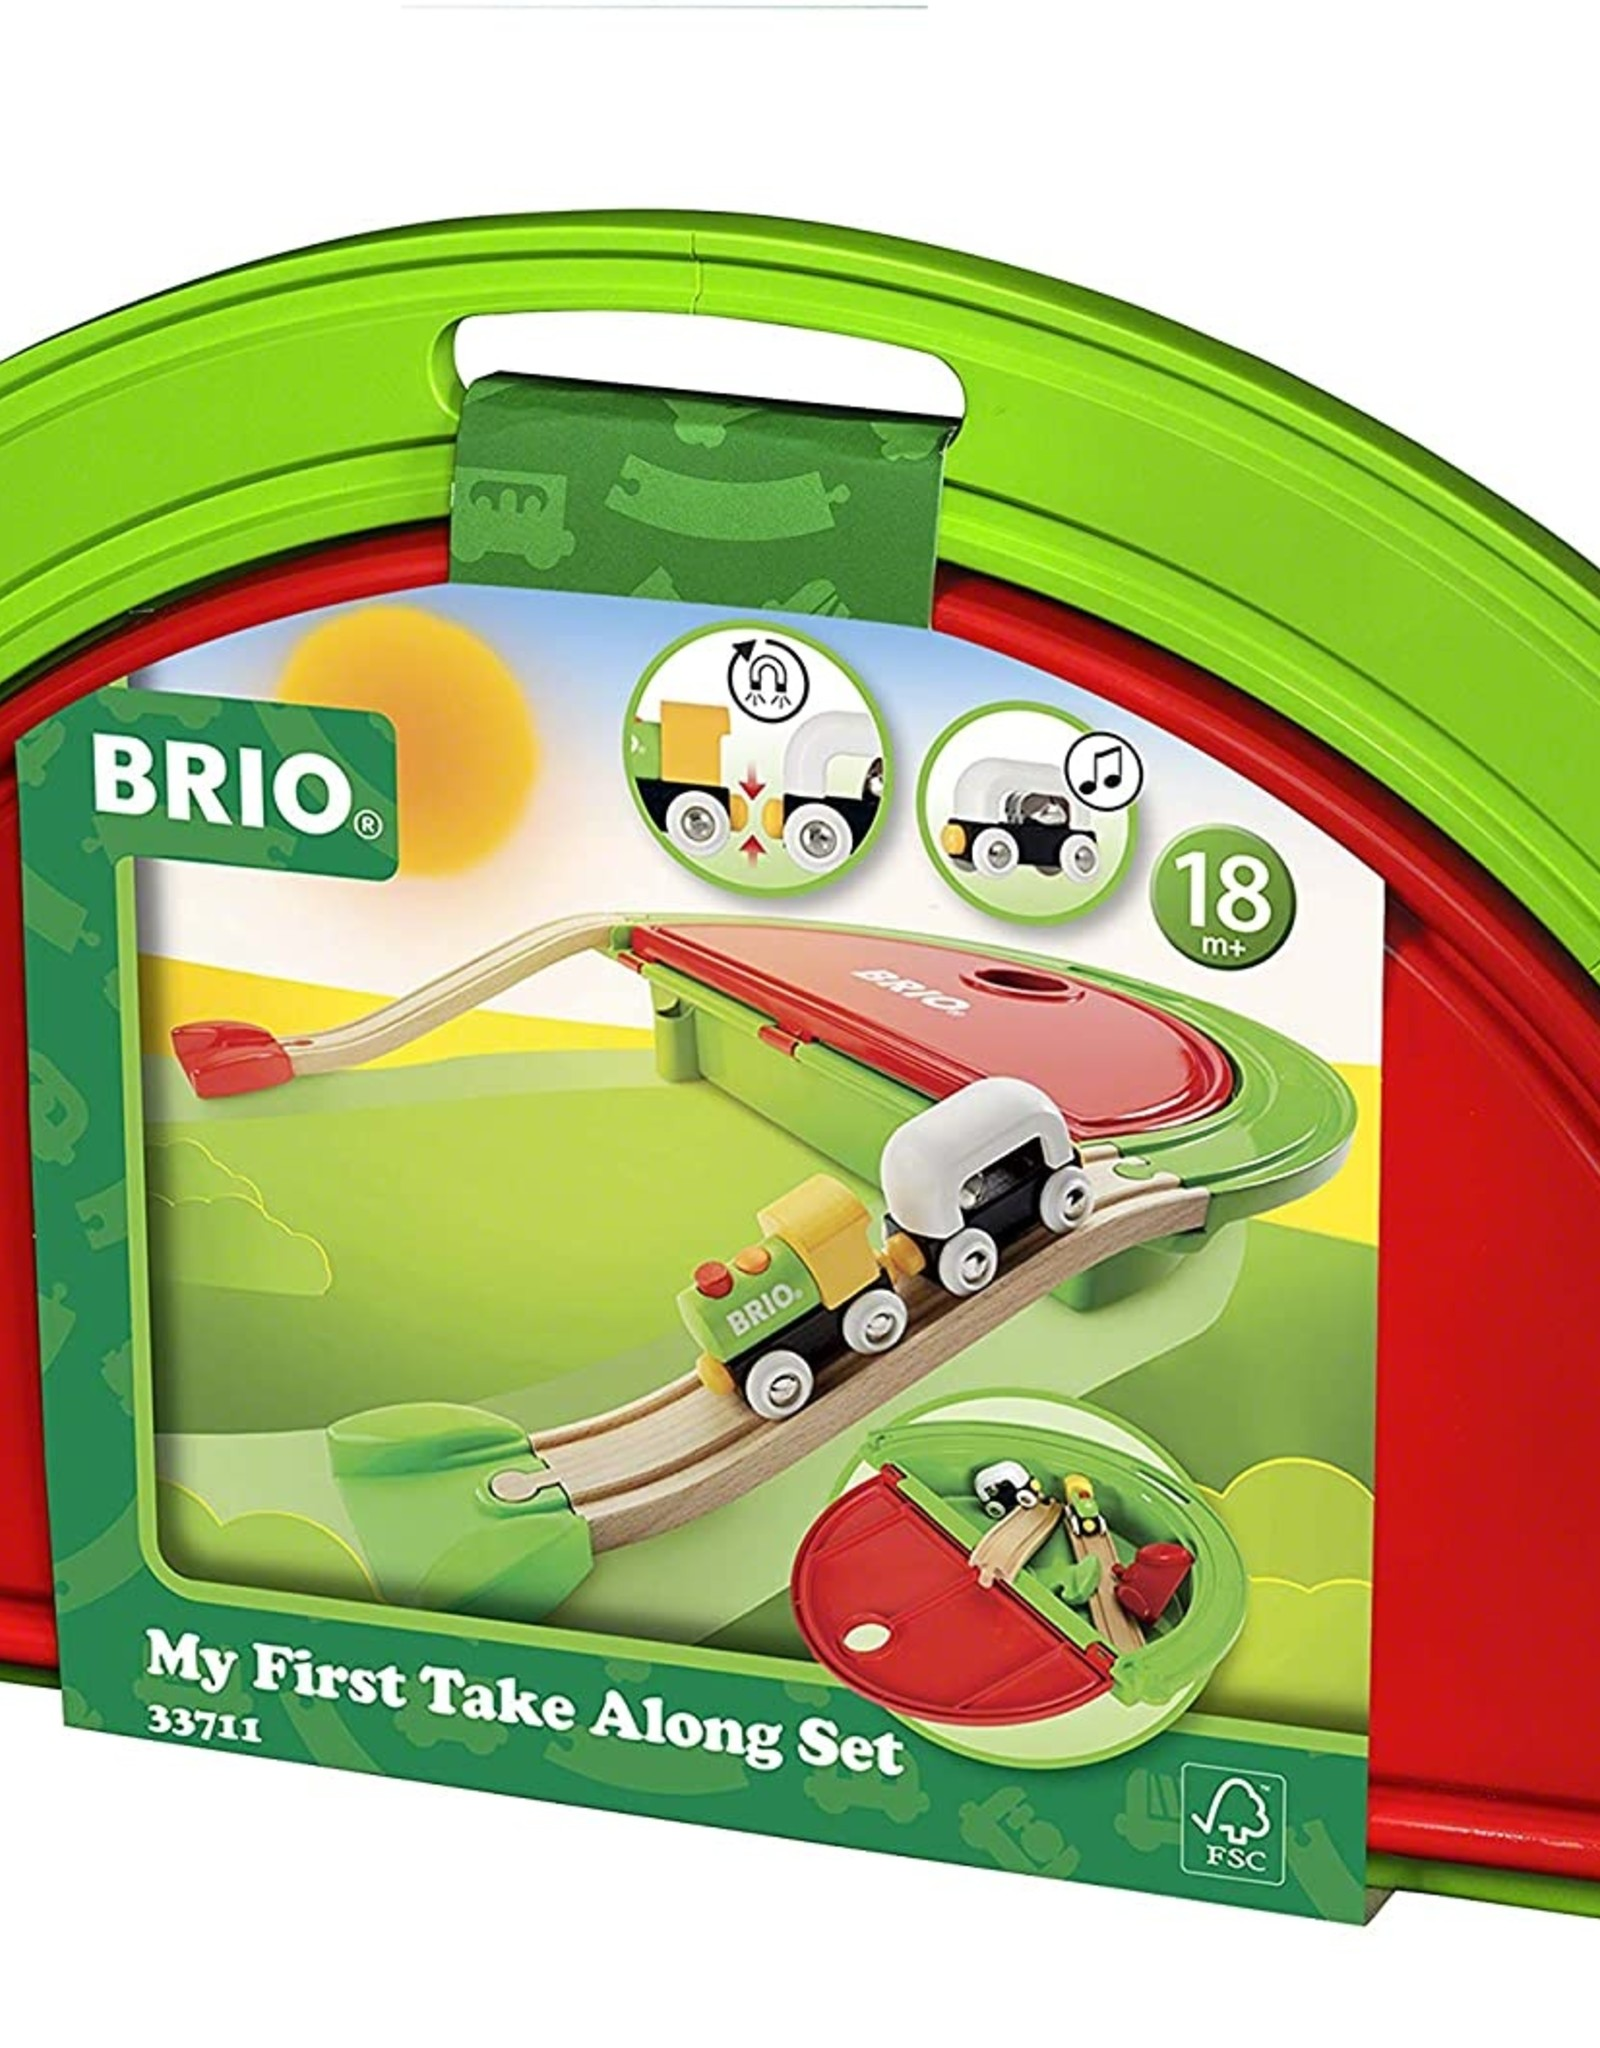 Brio BRIO My First Take Along Set